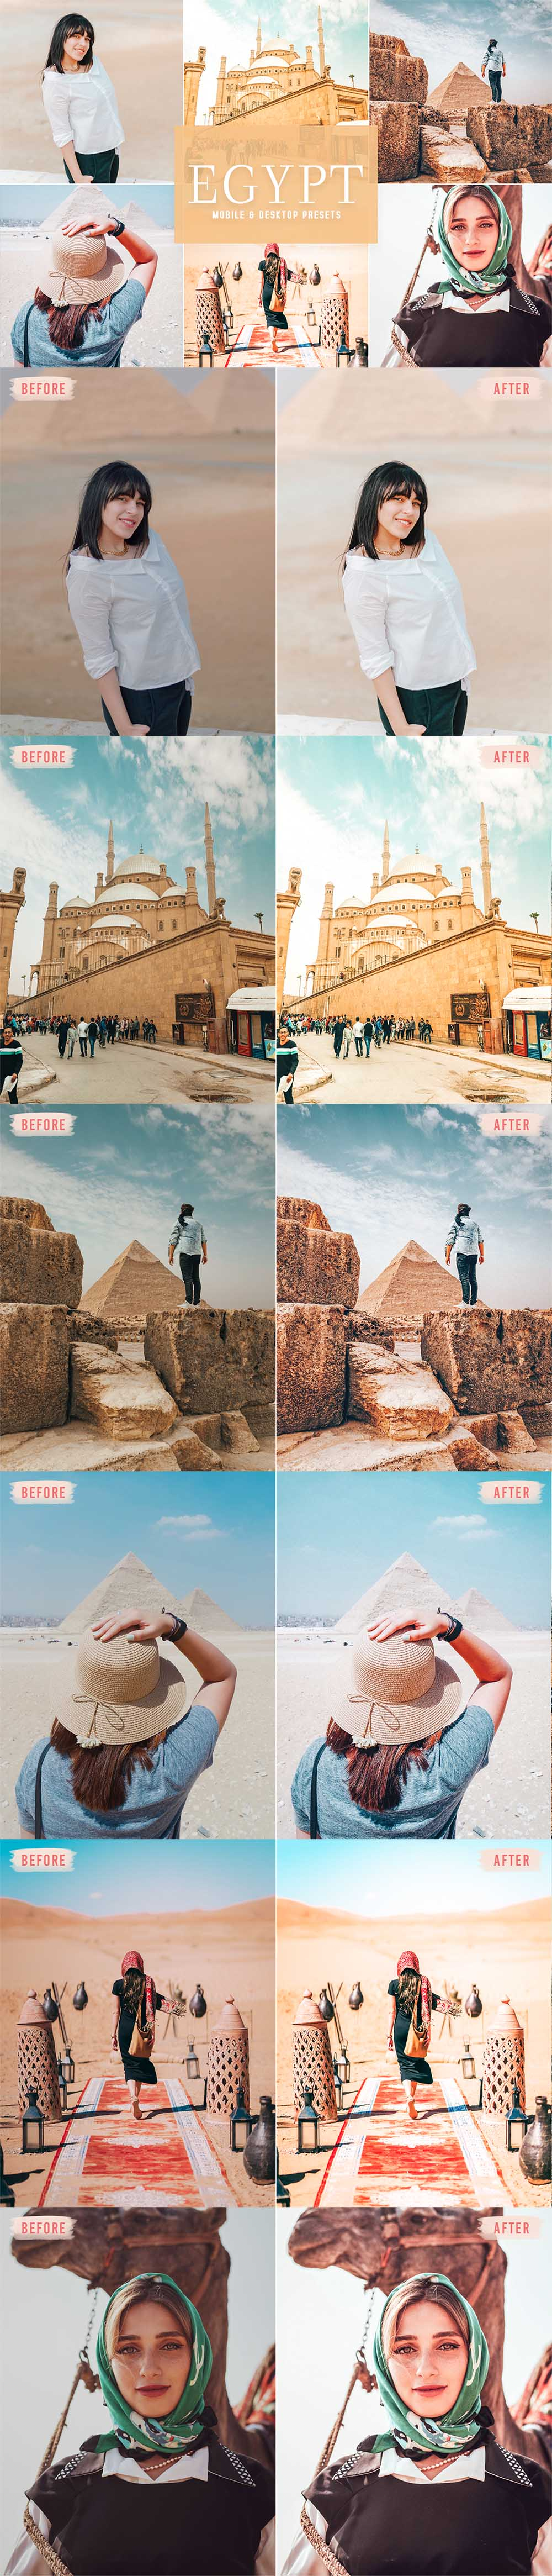 Free Egypt Lightroom Presets